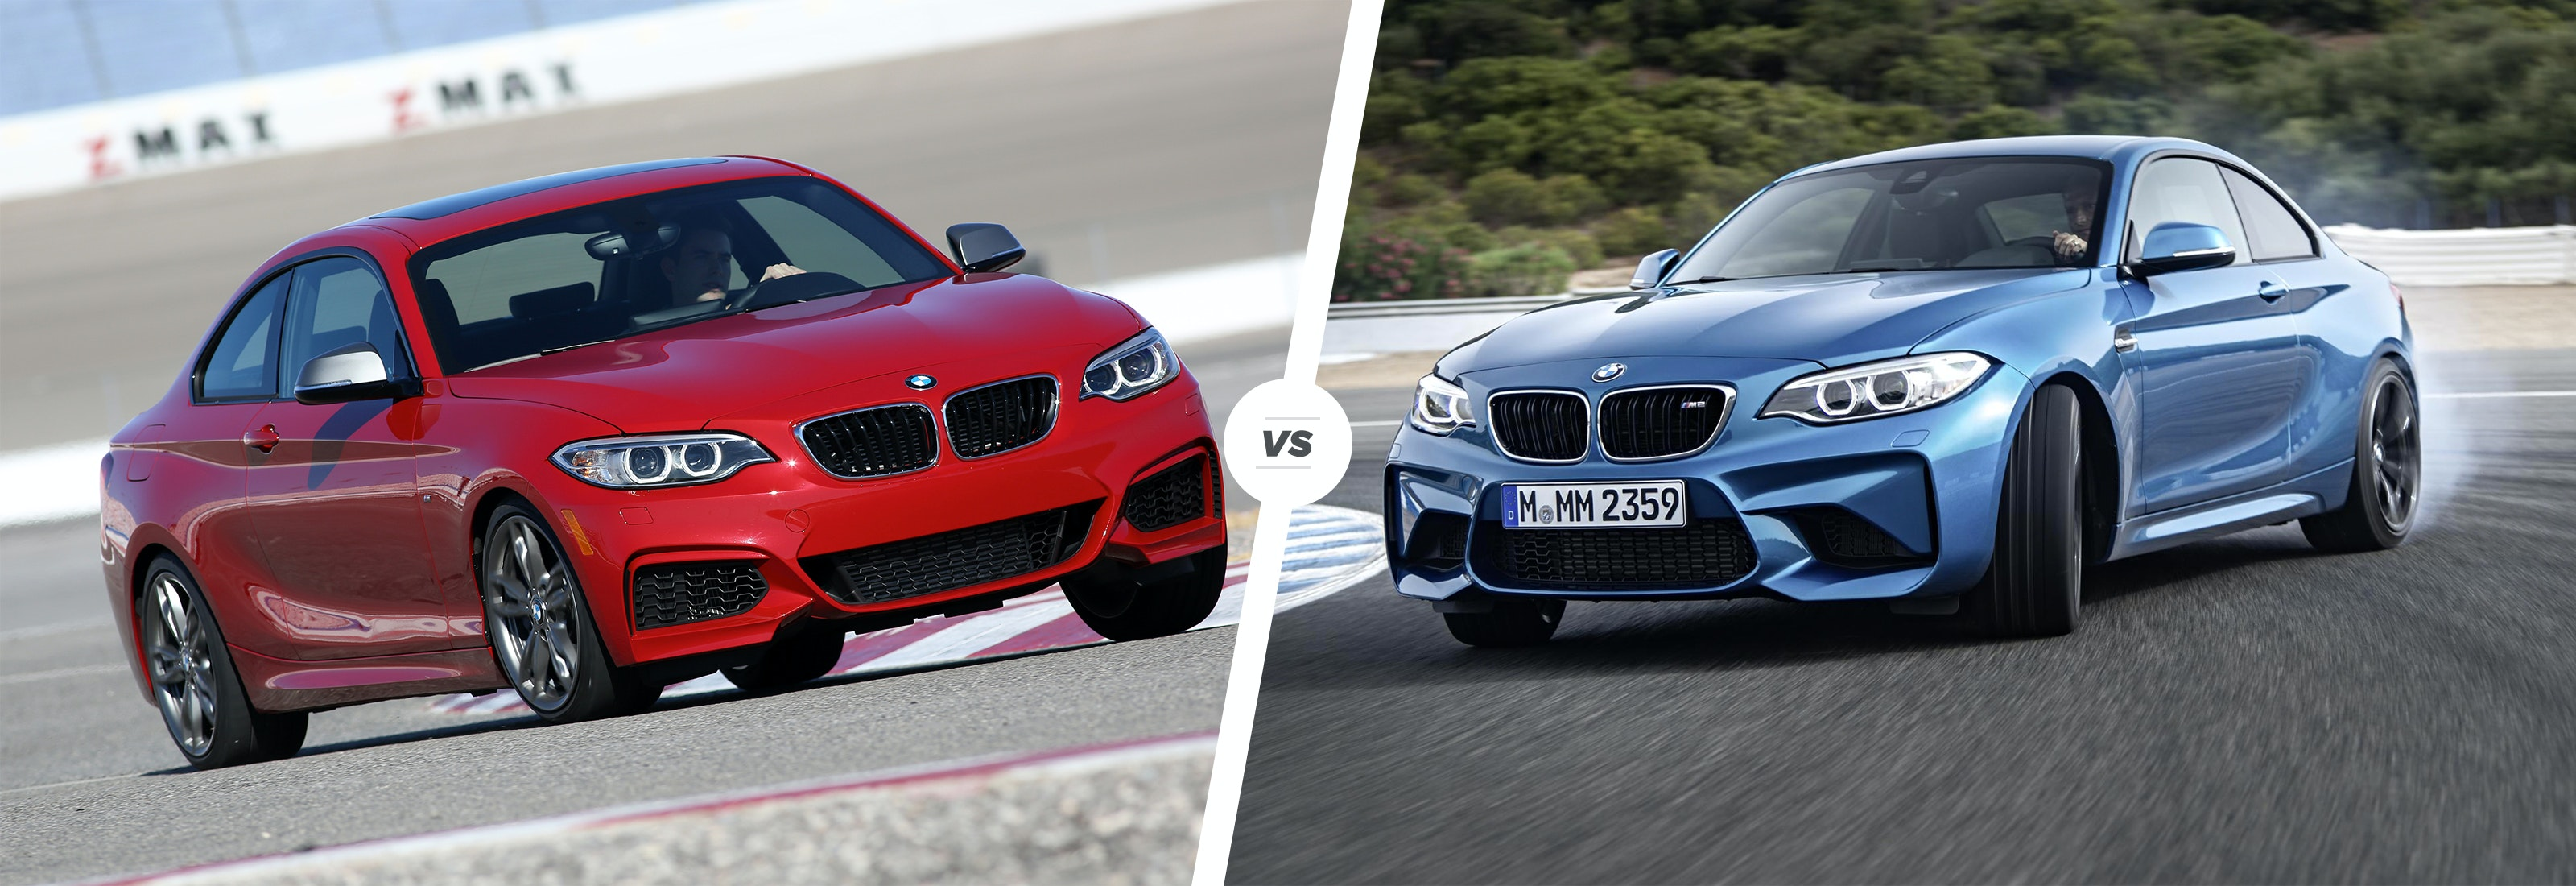 bmw m235i vs bmw m2 performance coupe clash carwow rh carwow co uk  bmw m2 vs m235i vs m240i